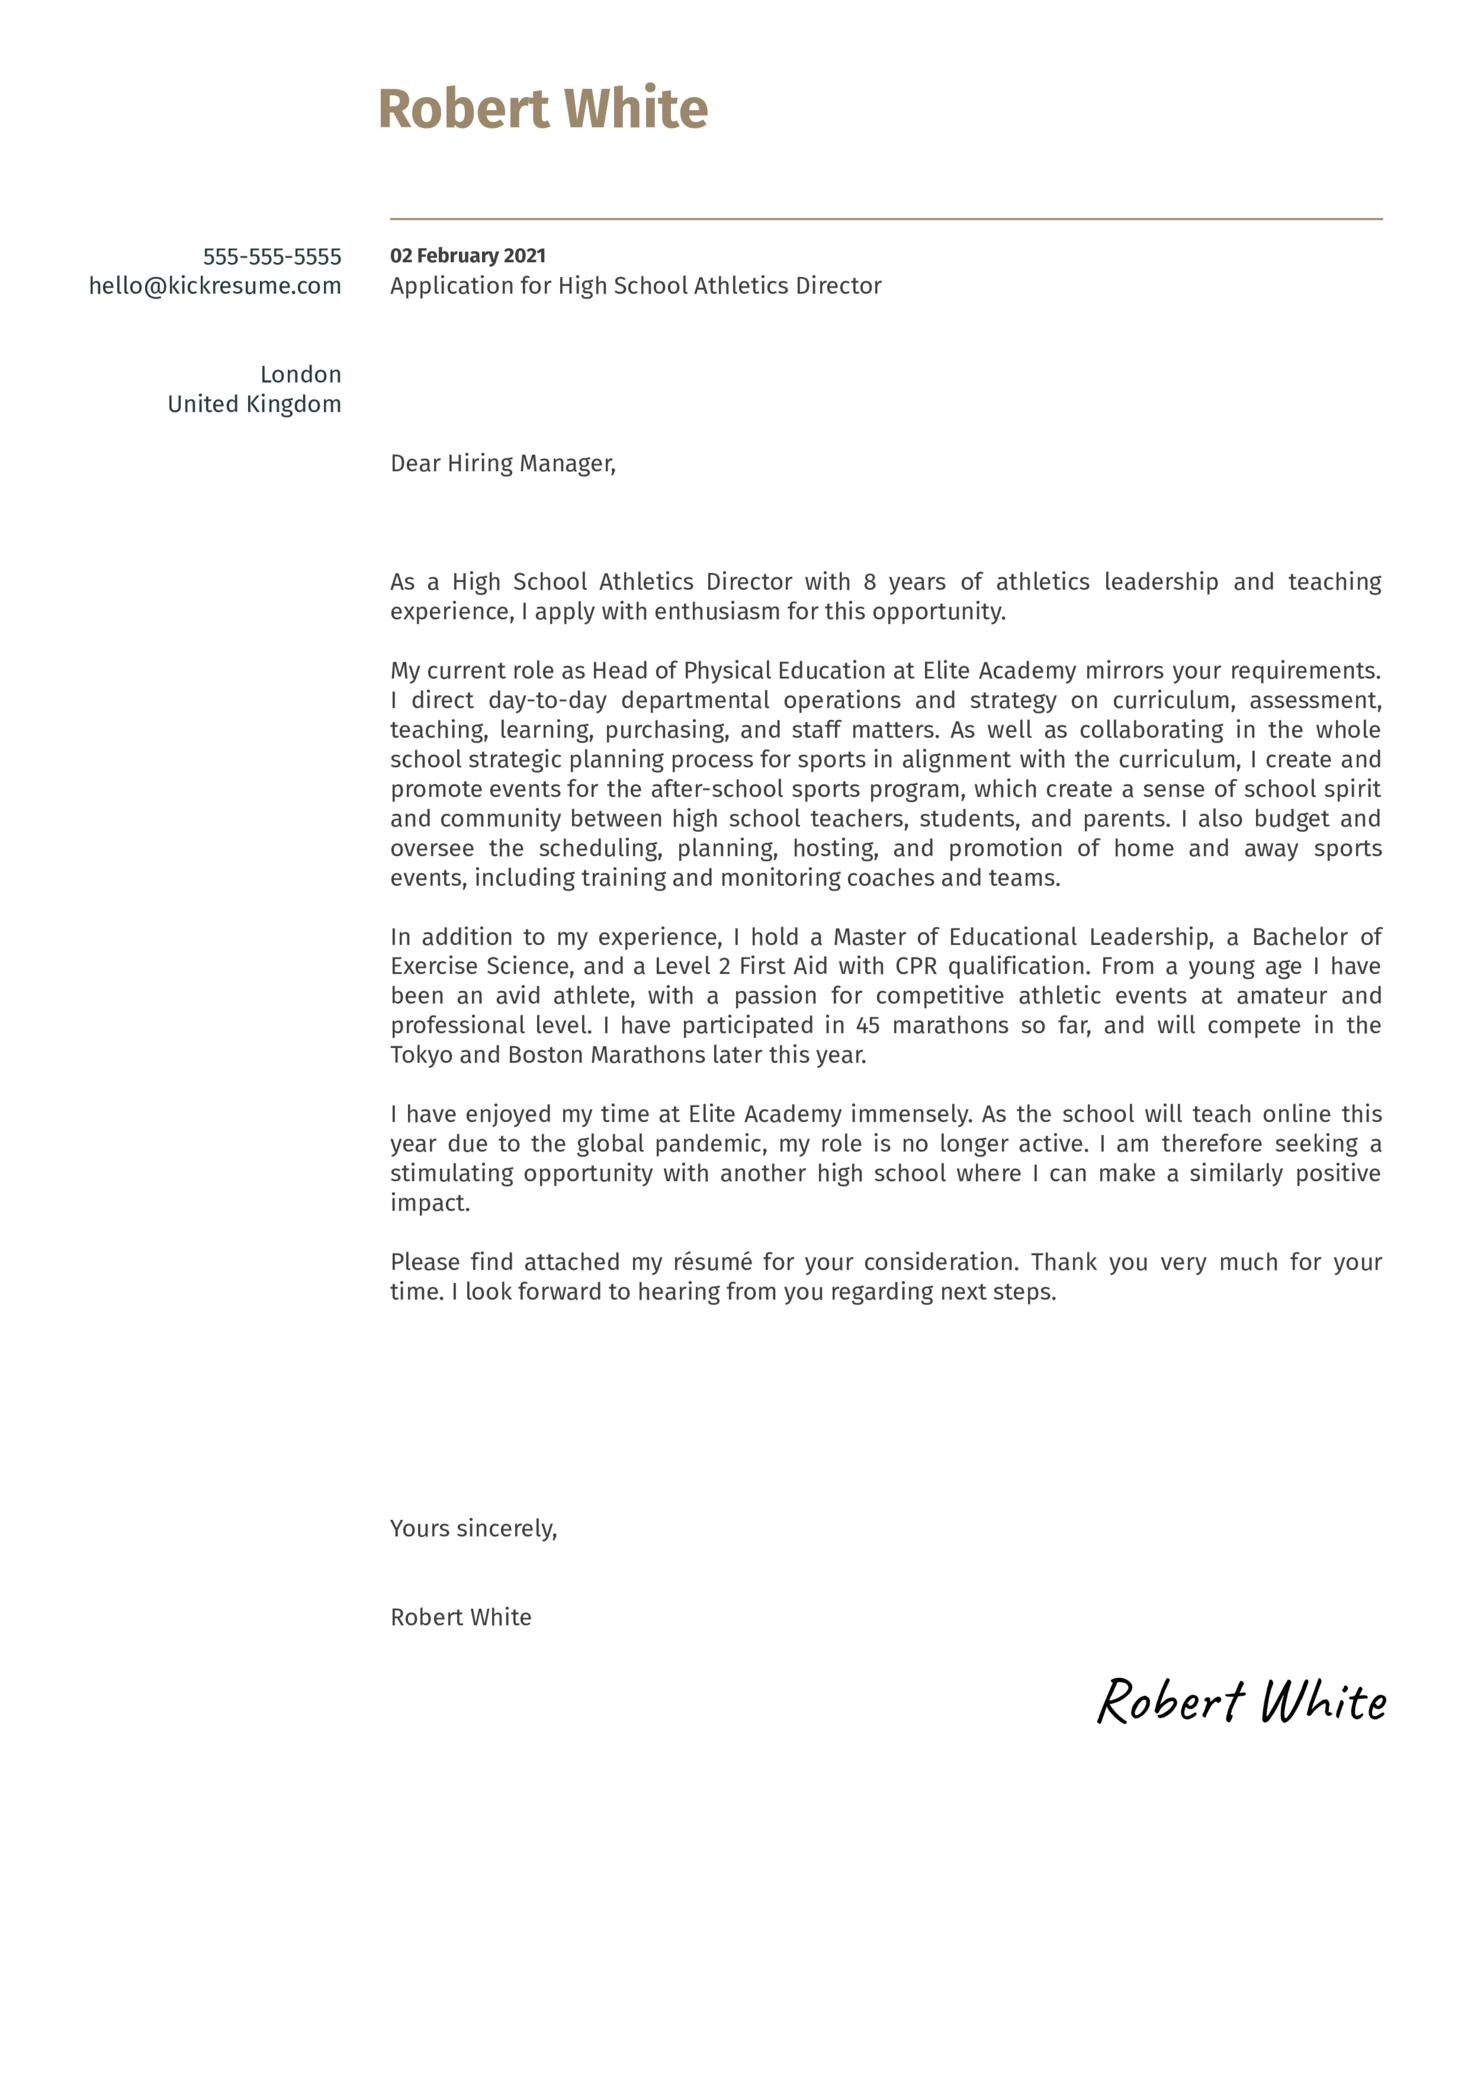 High School Athletics Director Cover Letter Sample